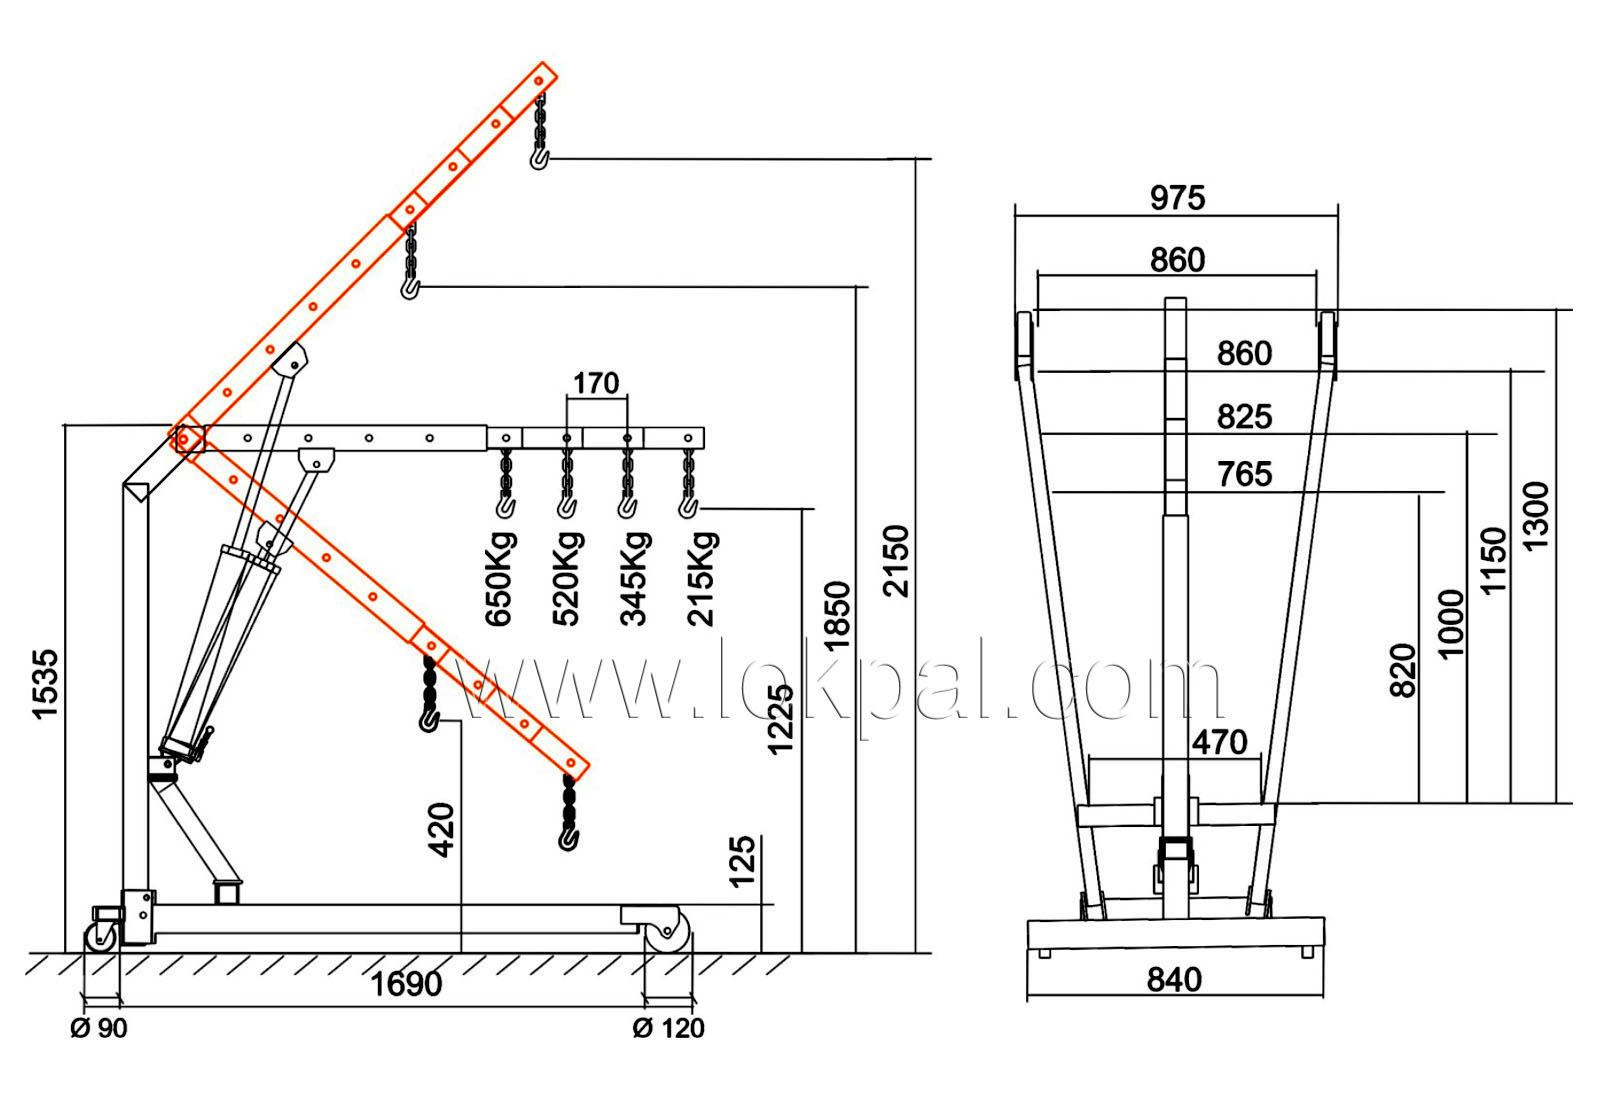 Wg Body Force Diagrams Engine Hoist Download Diagram